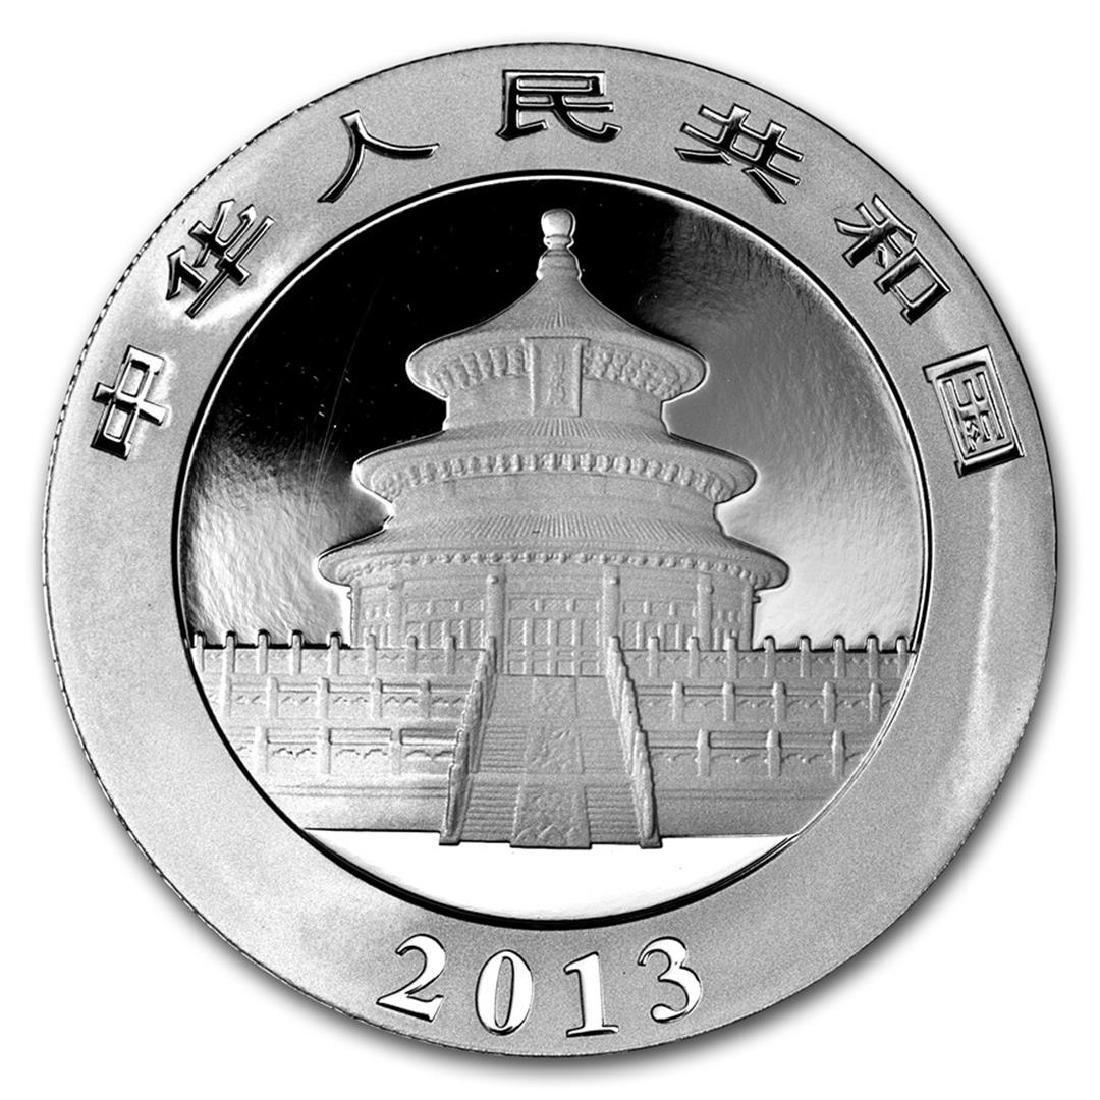 2013 10 Yuan China Silver Panda Coin - 2